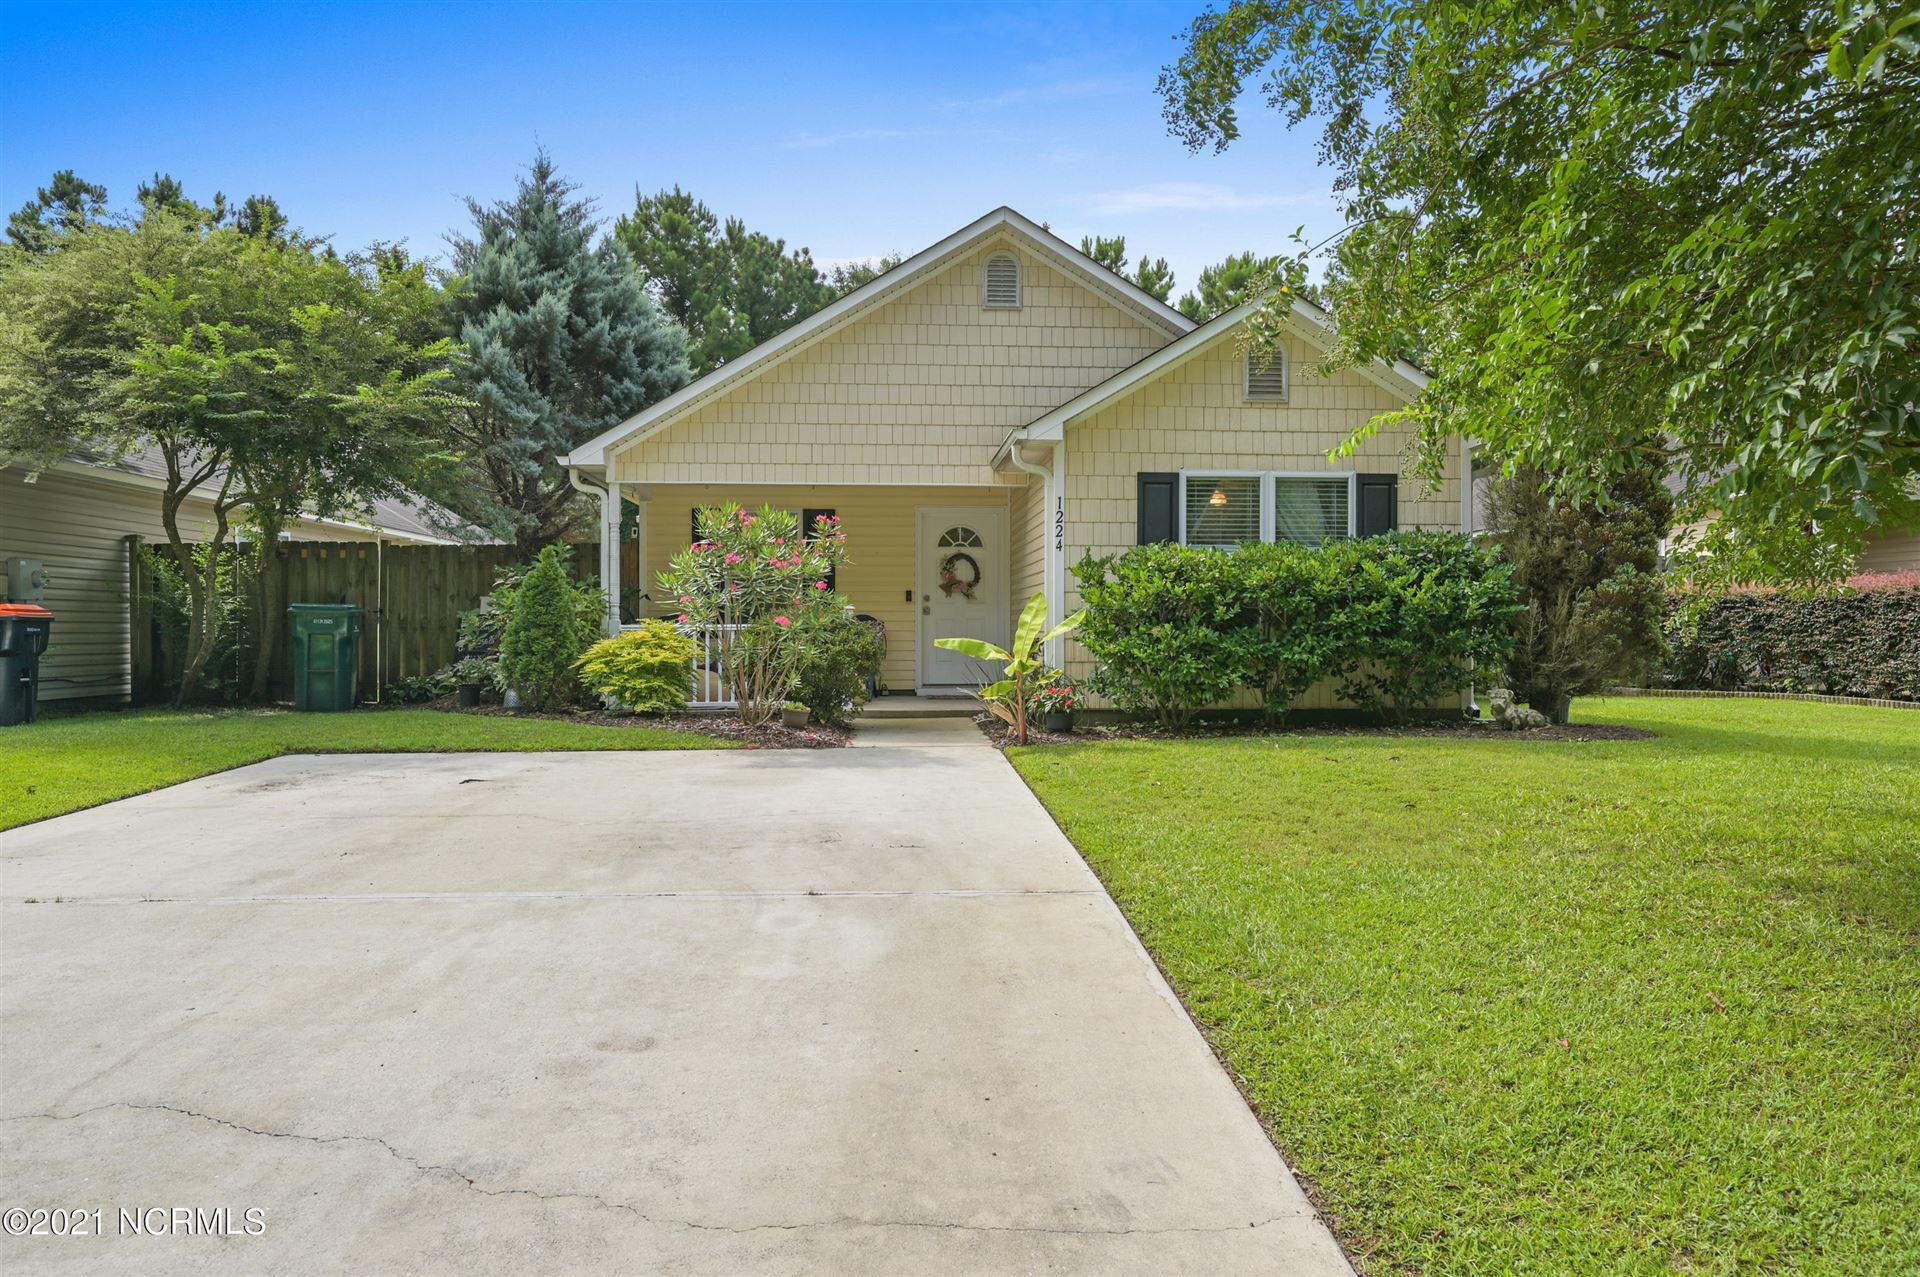 Photo for 1224 Beamon Lane, Wilmington, NC 28412 (MLS # 100283453)